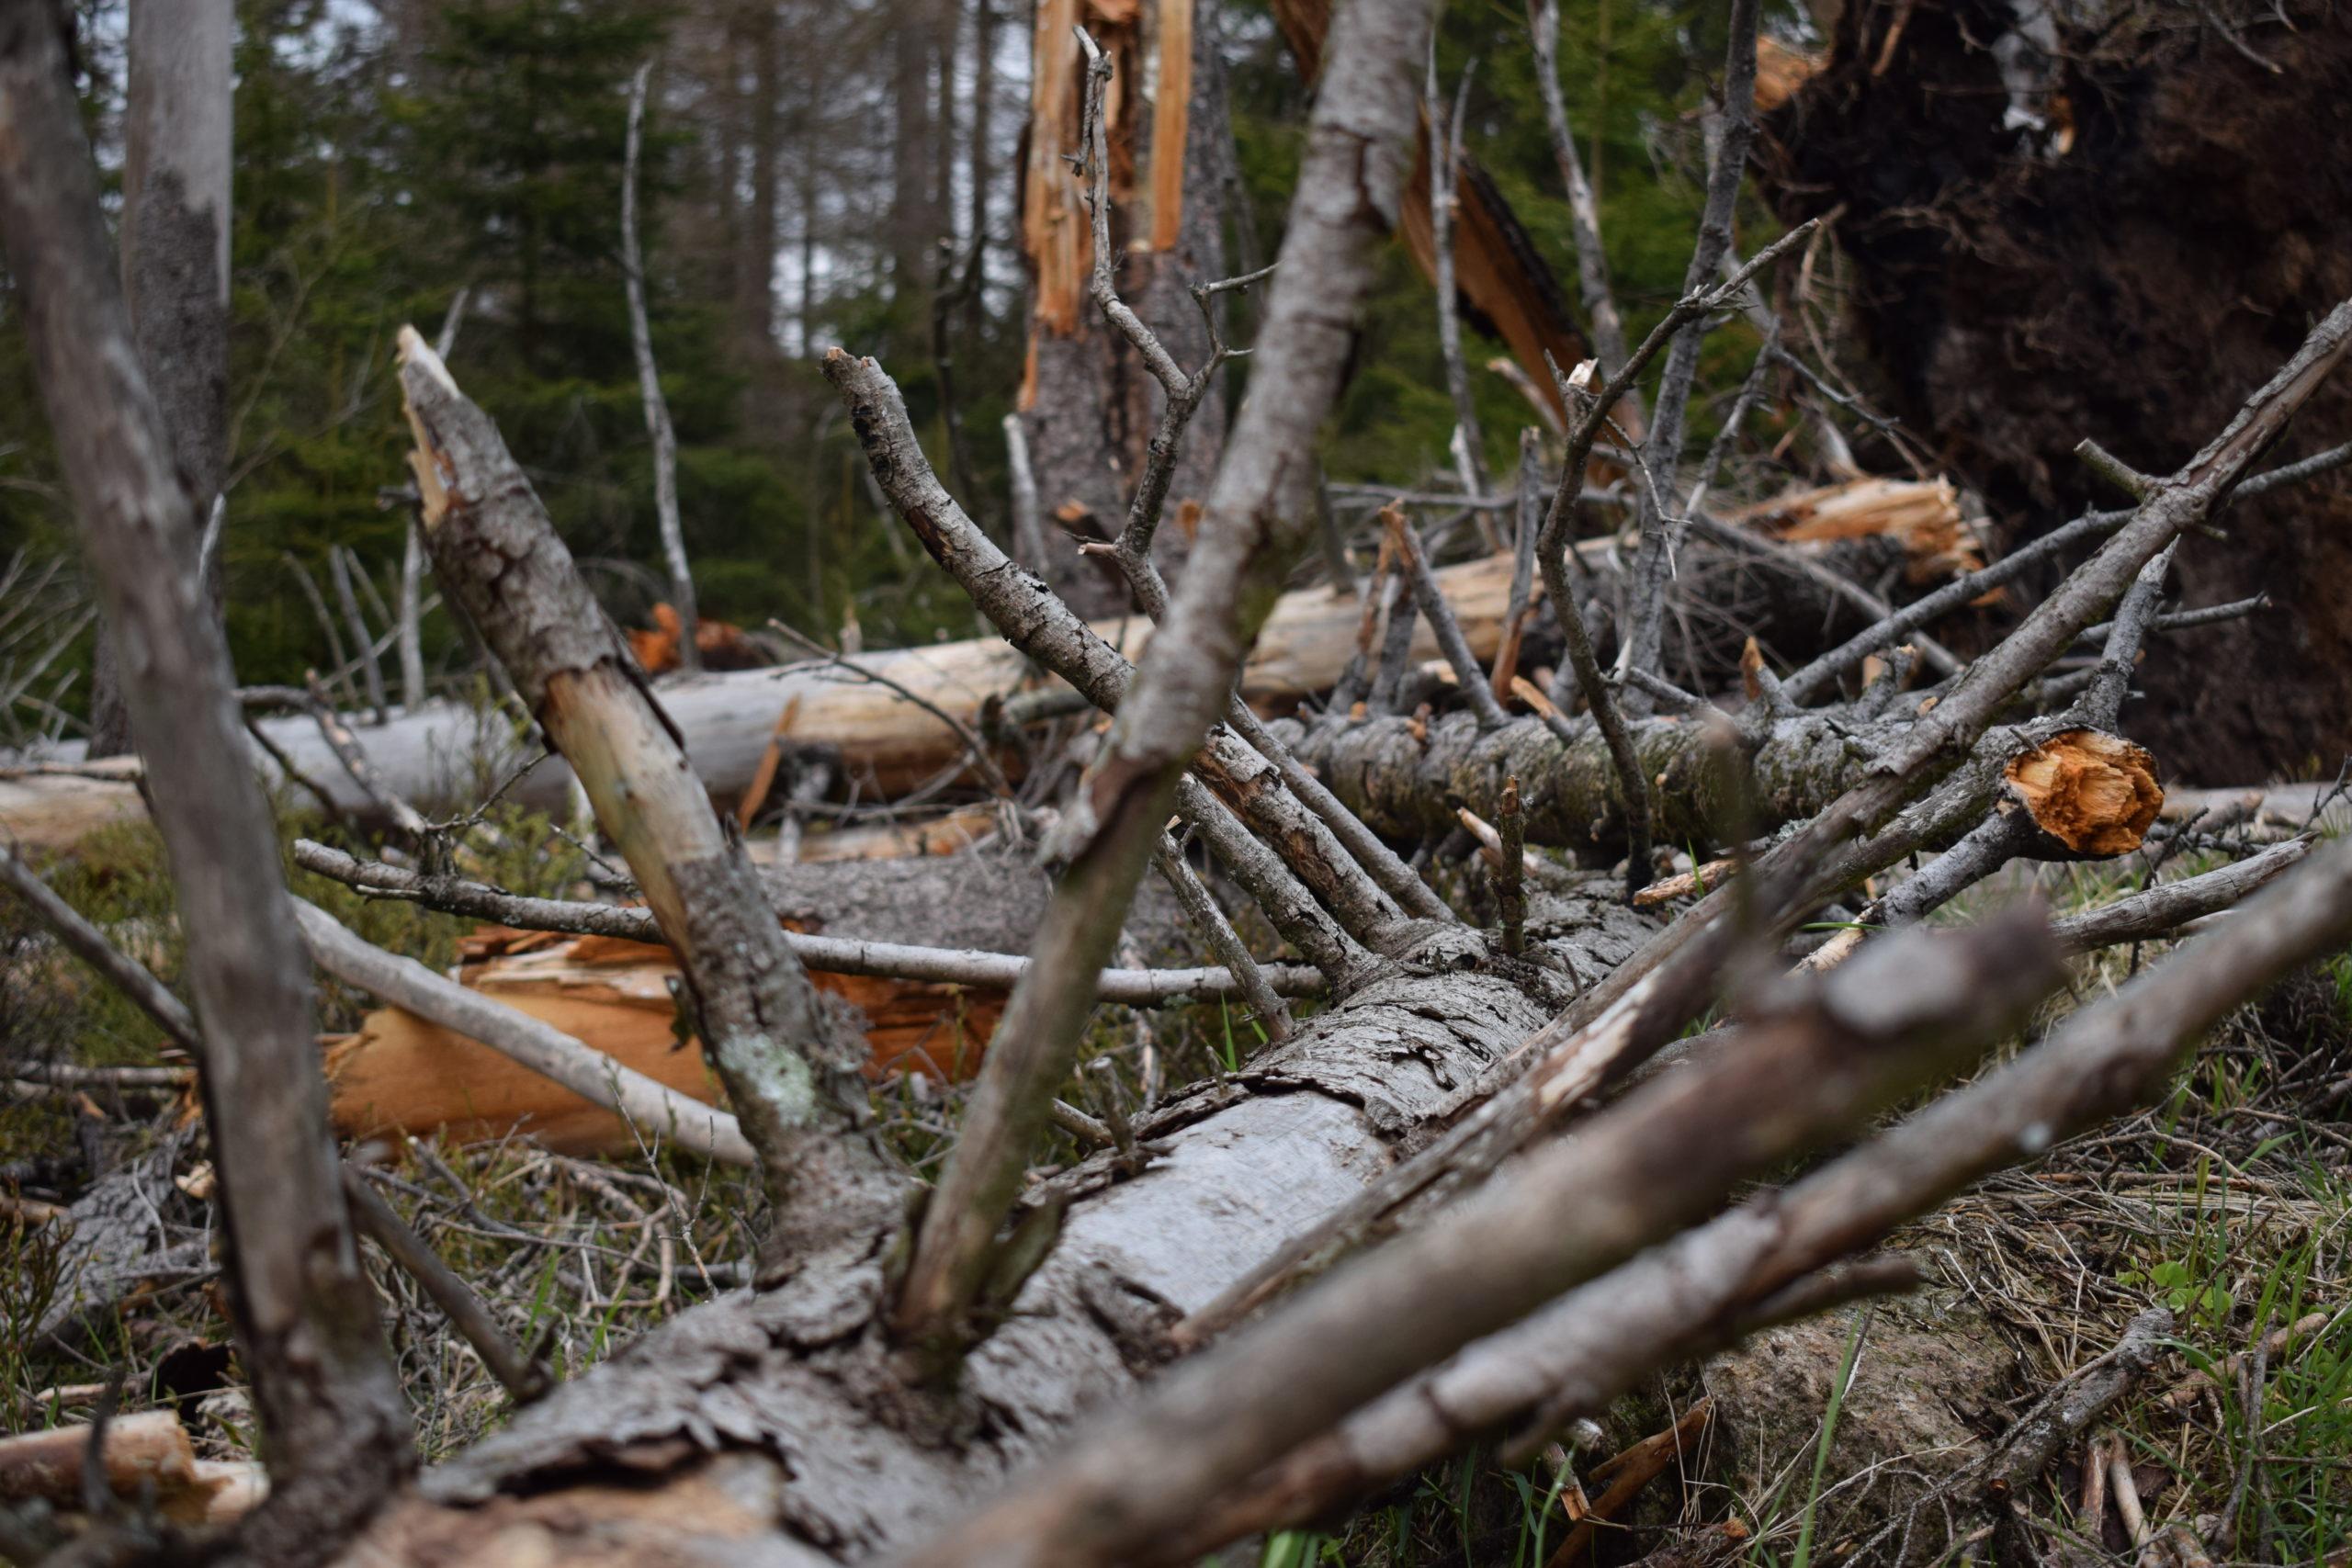 she wanders - Totholz als Lebensraum im Harz